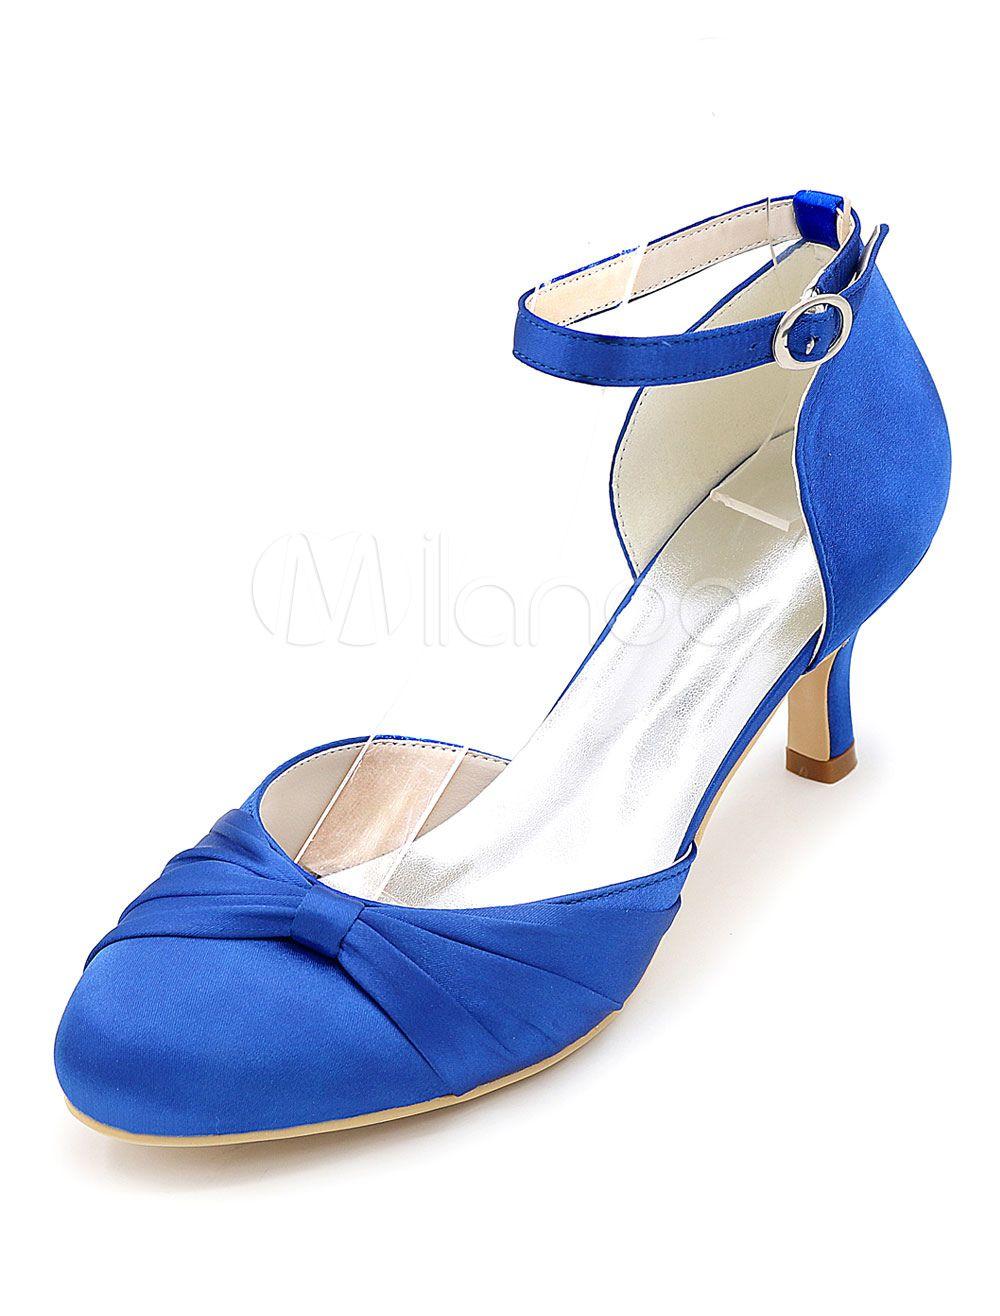 28da9ec378c Ivory Bridal Shoes Satin High Heel Round Toe Ankle Strap Kitten Heel Pumps  For Wedding